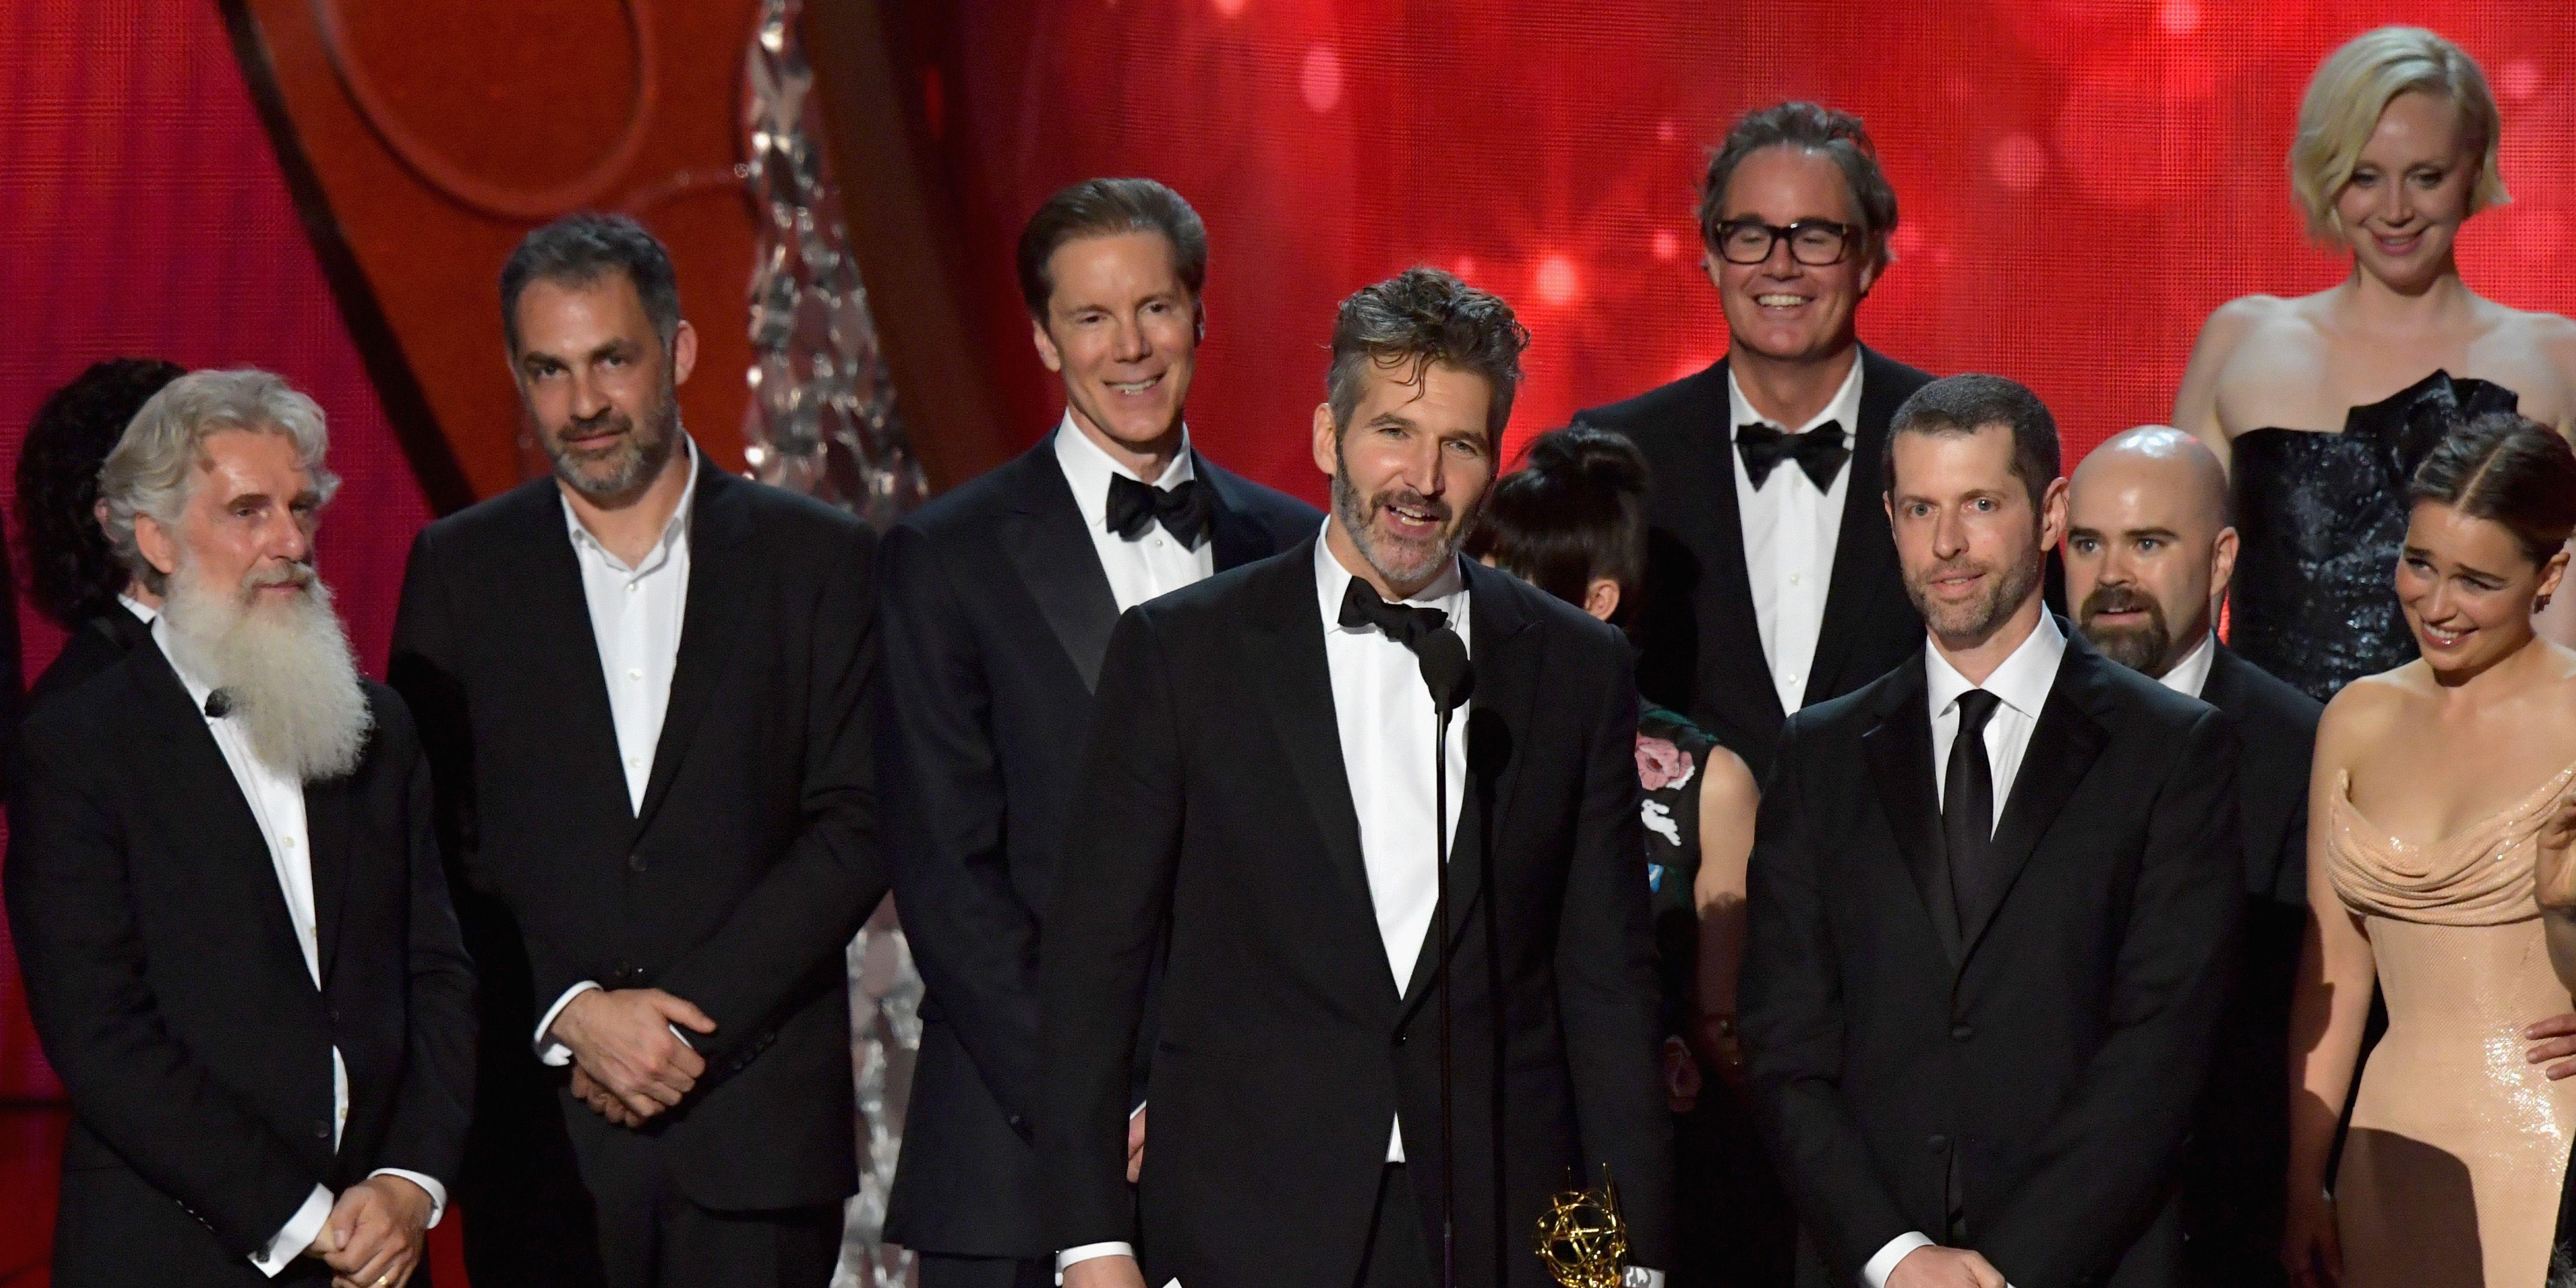 Game of Thrones' David Benioff, D.B. Weiss win Emmy